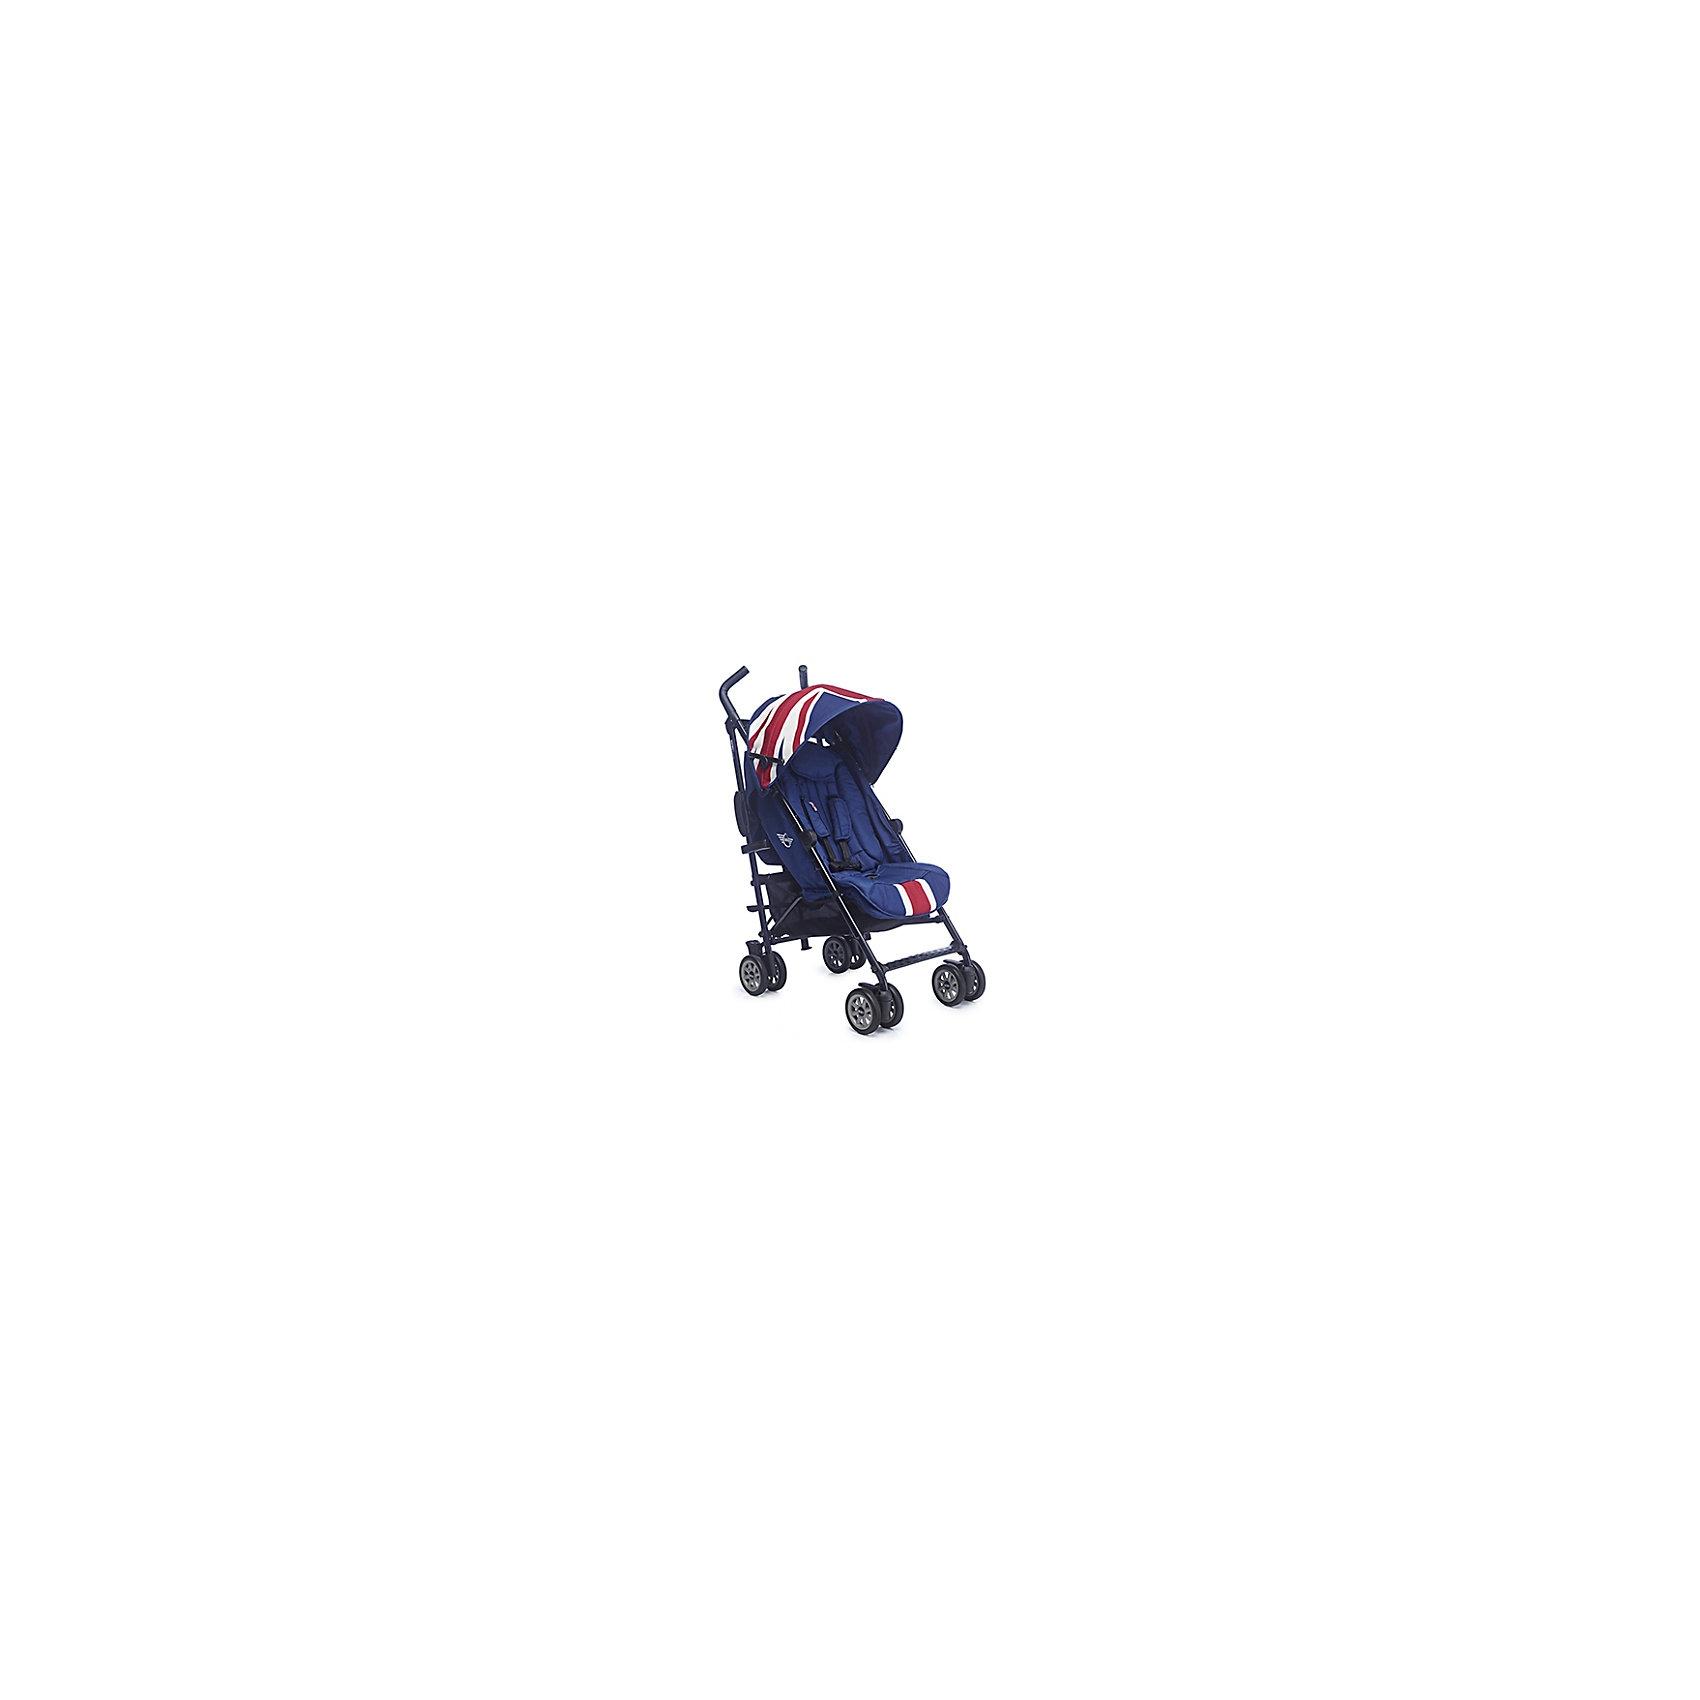 Коляска-трость Easywalker MINI Union Jack Classic, dark blueКоляски-трости<br>EMB10022 Коляска MINI by Easywalker buggy Union Jack Classic + EB10104 Бампер Easywalker buggy bumper bar Dark Blue<br><br>Ширина мм: 1020<br>Глубина мм: 230<br>Высота мм: 280<br>Вес г: 9140<br>Возраст от месяцев: 0<br>Возраст до месяцев: 48<br>Пол: Унисекс<br>Возраст: Детский<br>SKU: 5613099